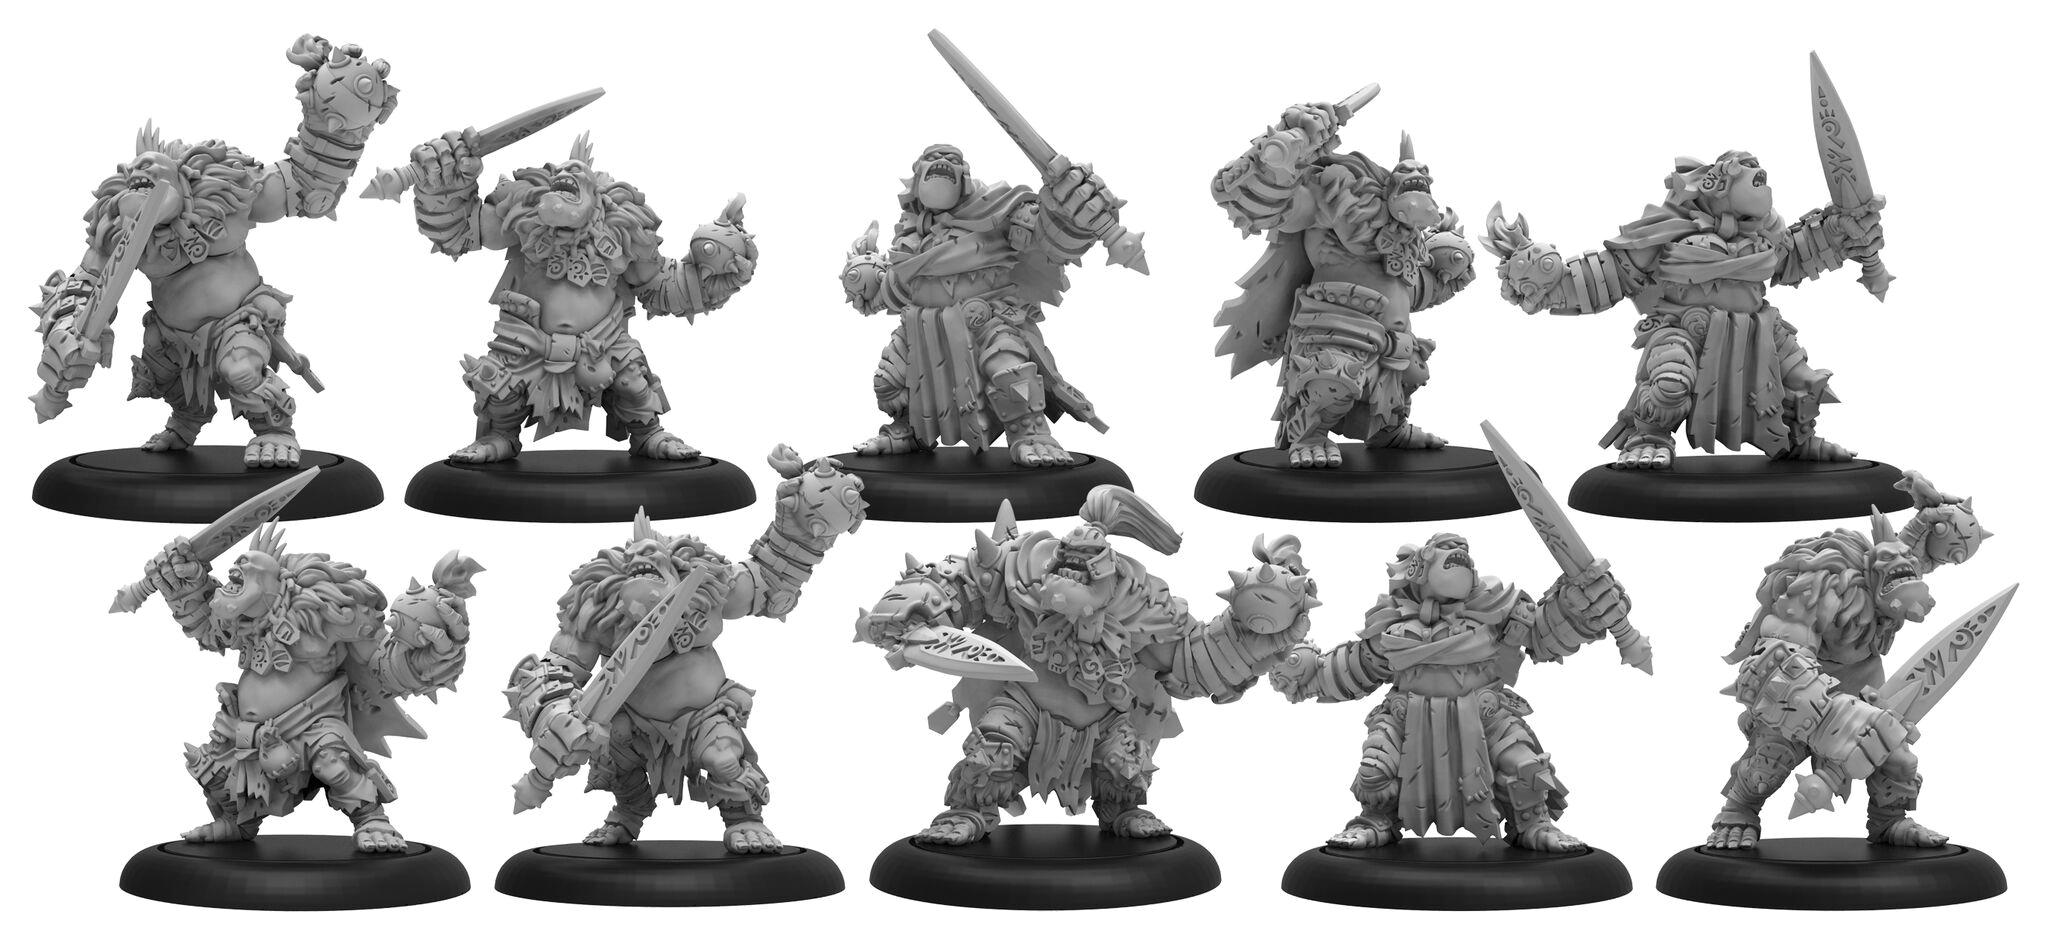 Hordes: Trollblood Northkin Raiders Unit Attachment (resin/metal) Box Front